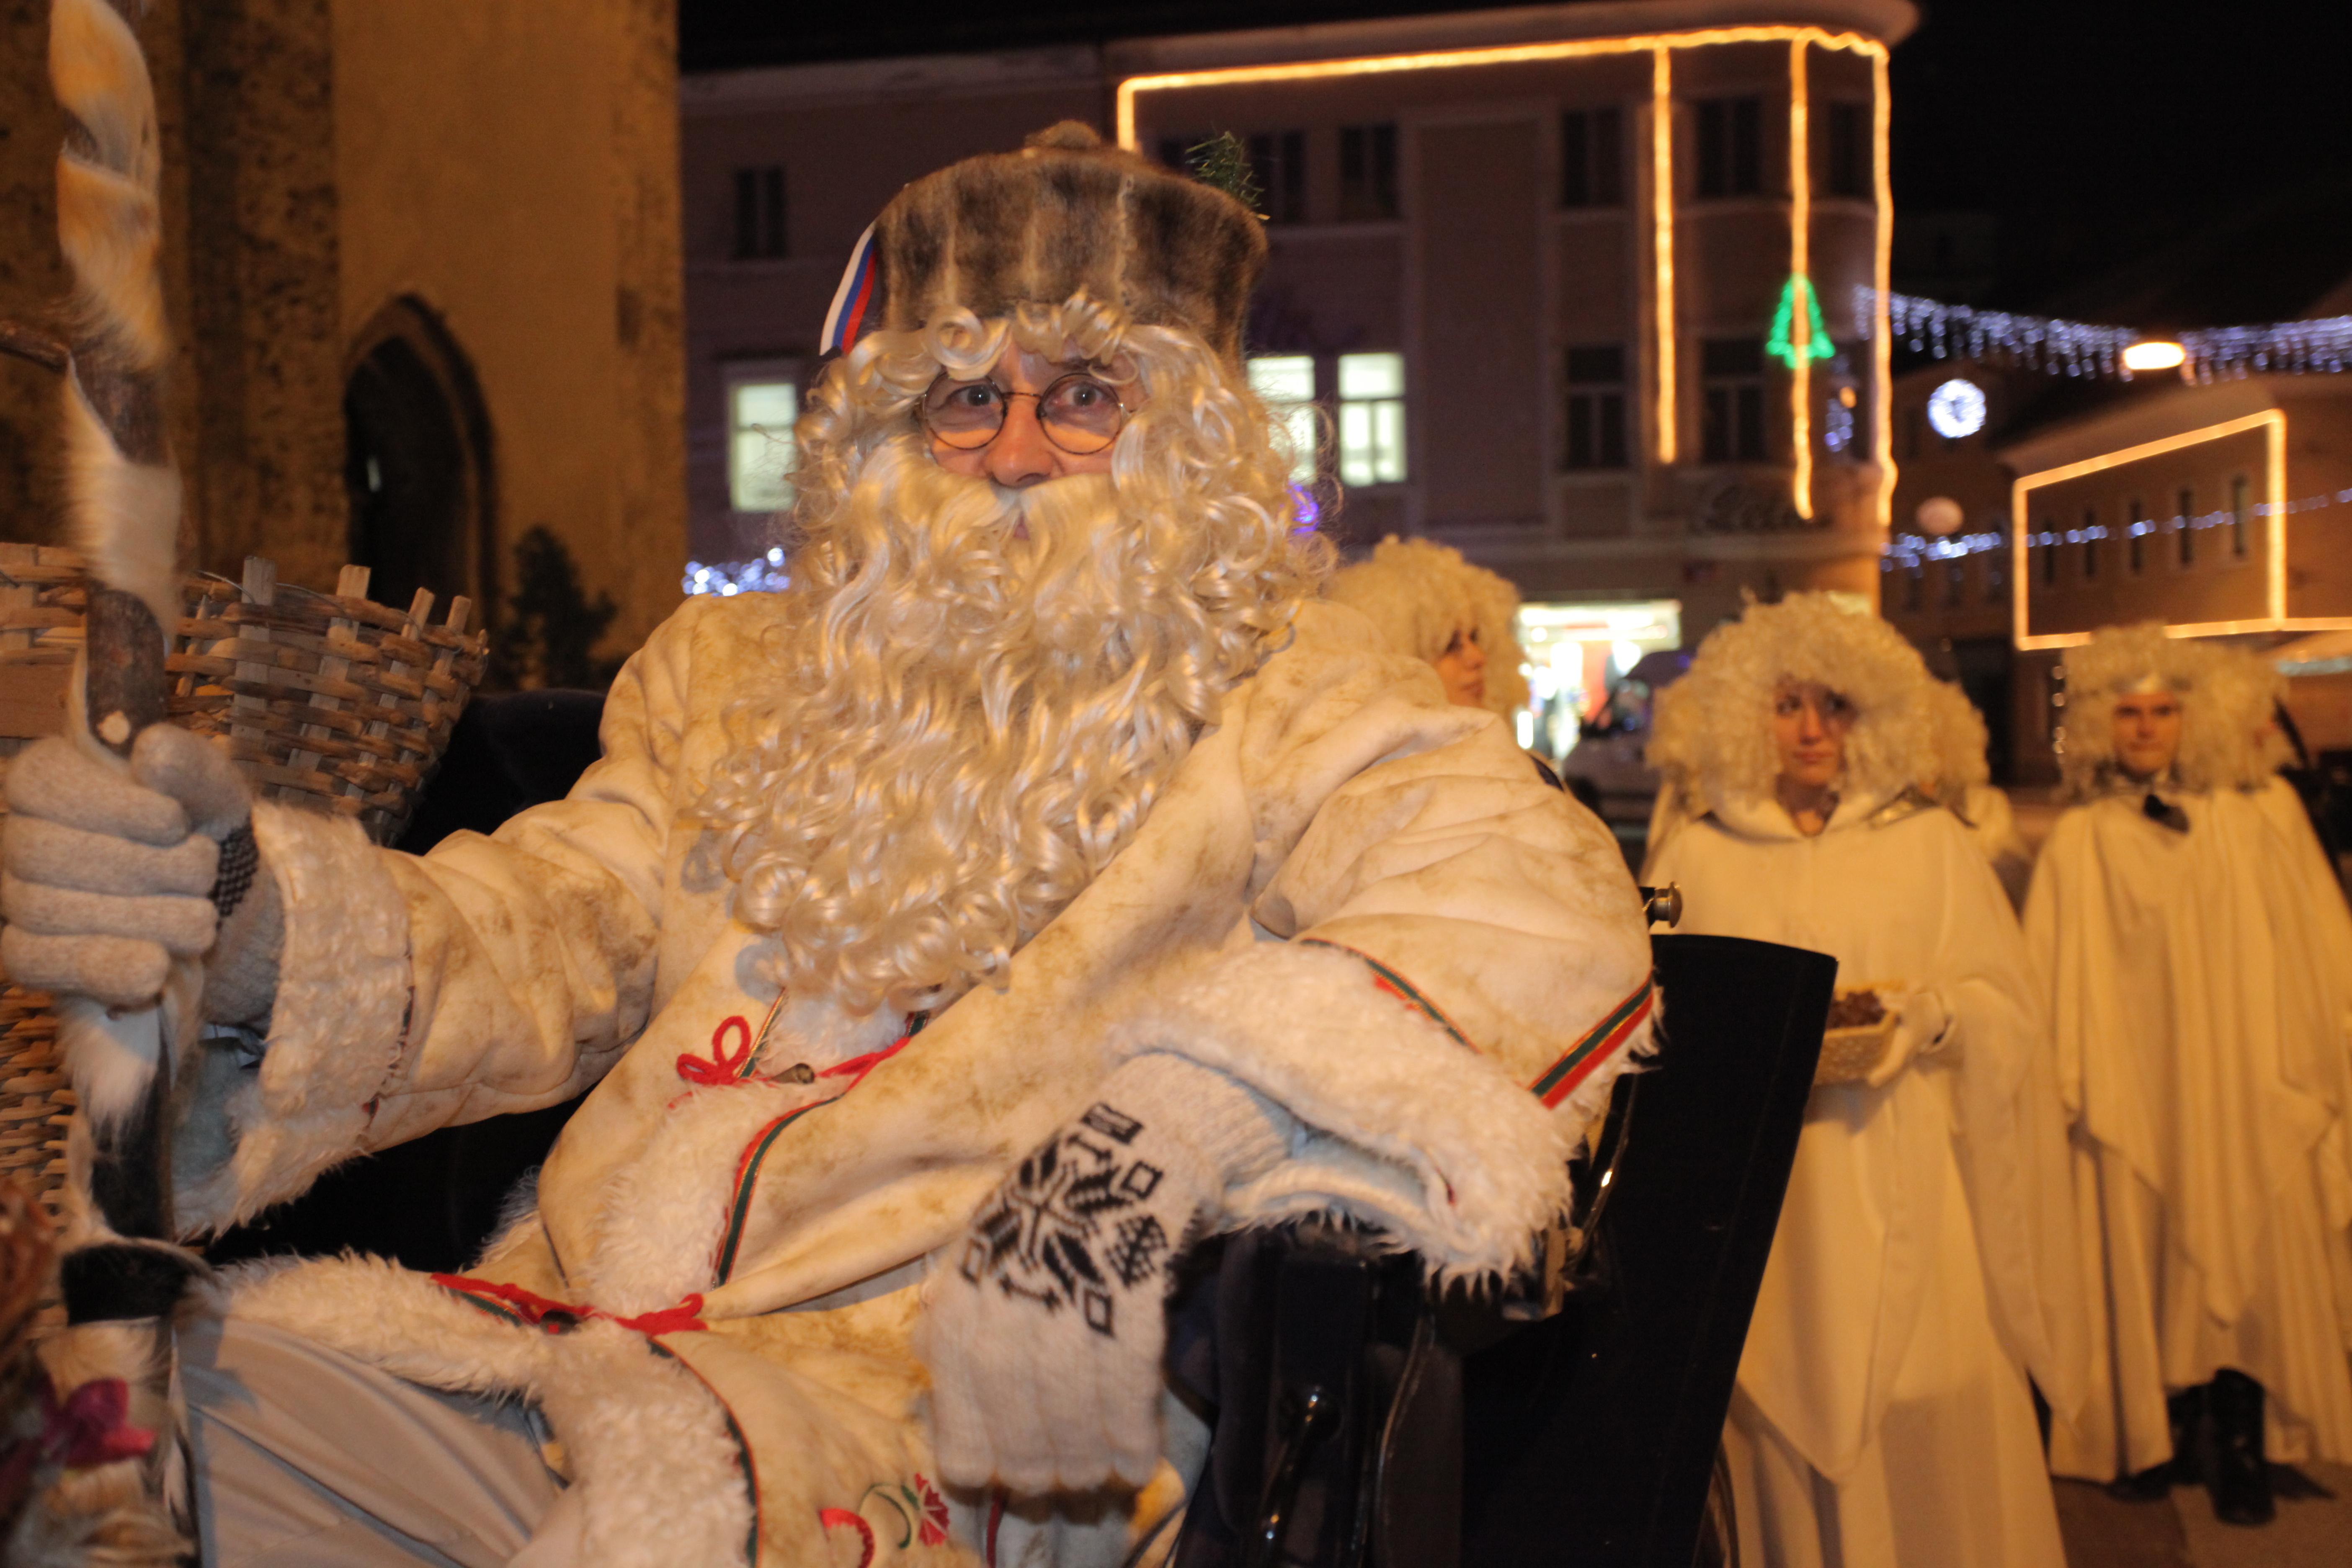 Ste to vedeli o Dedku Mrazu?